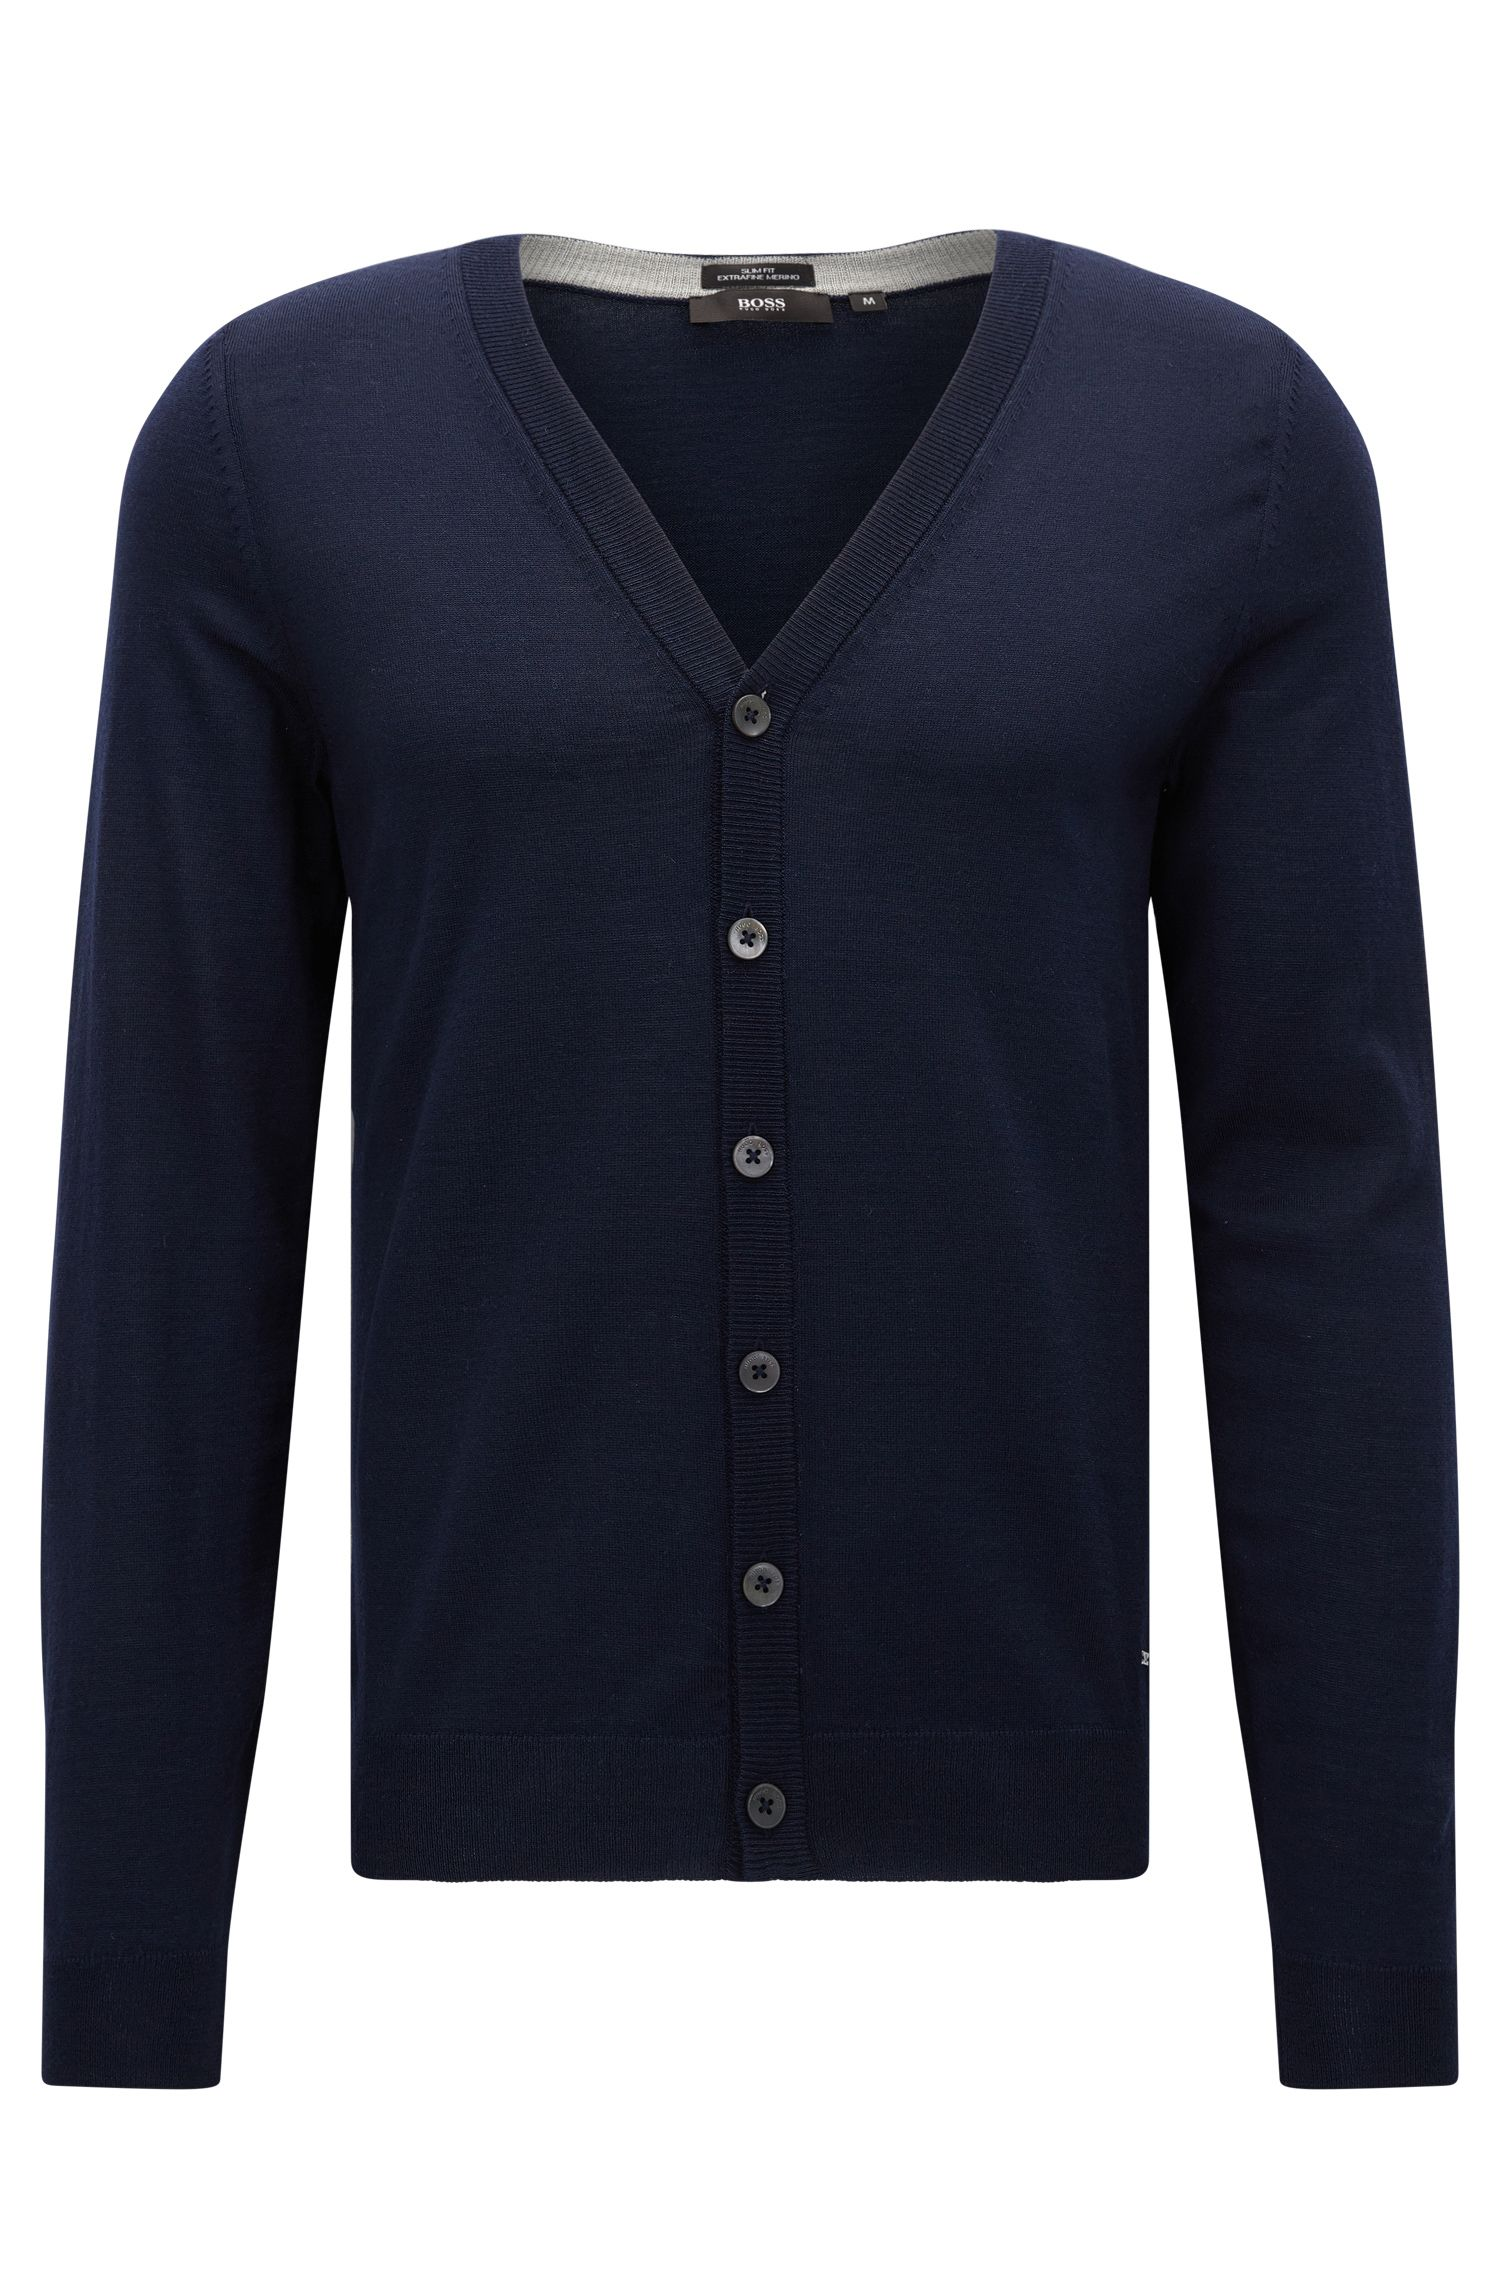 Extra-Fine Virgin Merino Wool Sweater, Slim FIt | Mardon M